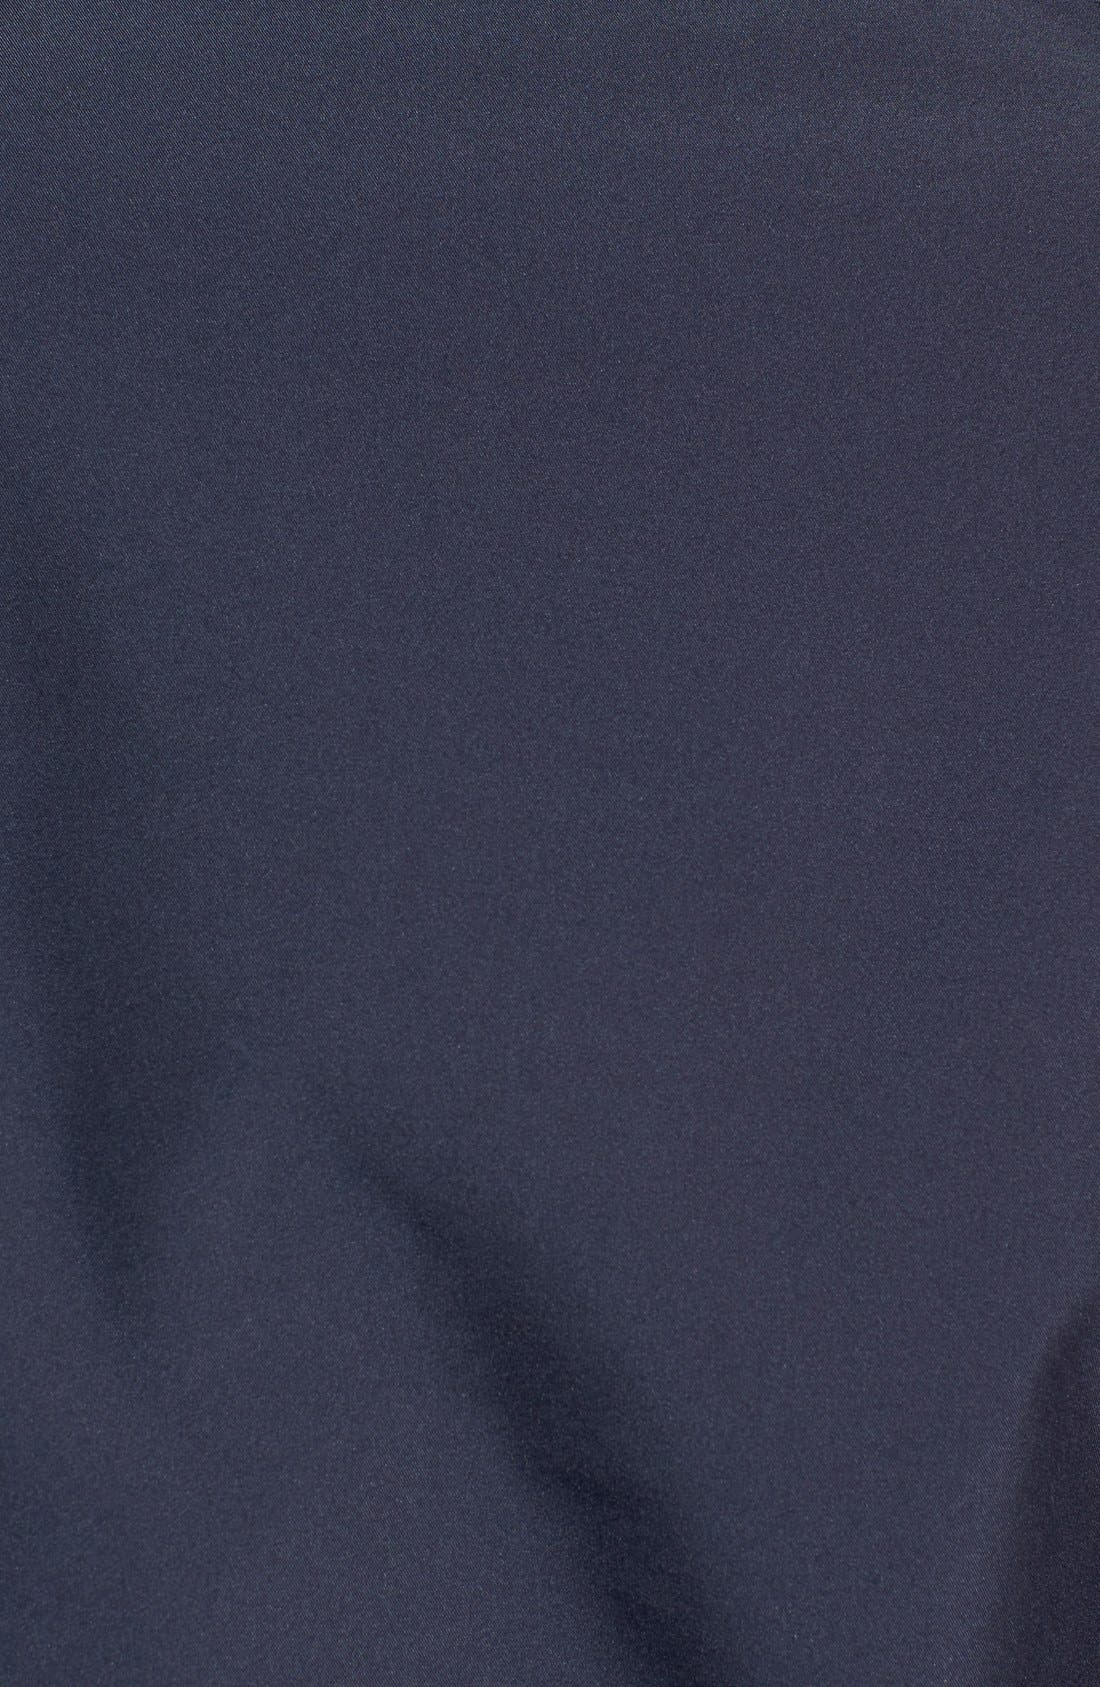 CUTTER & BUCK,                             Denver Broncos - Beacon WeatherTec Wind & Water Resistant Jacket,                             Alternate thumbnail 3, color,                             420